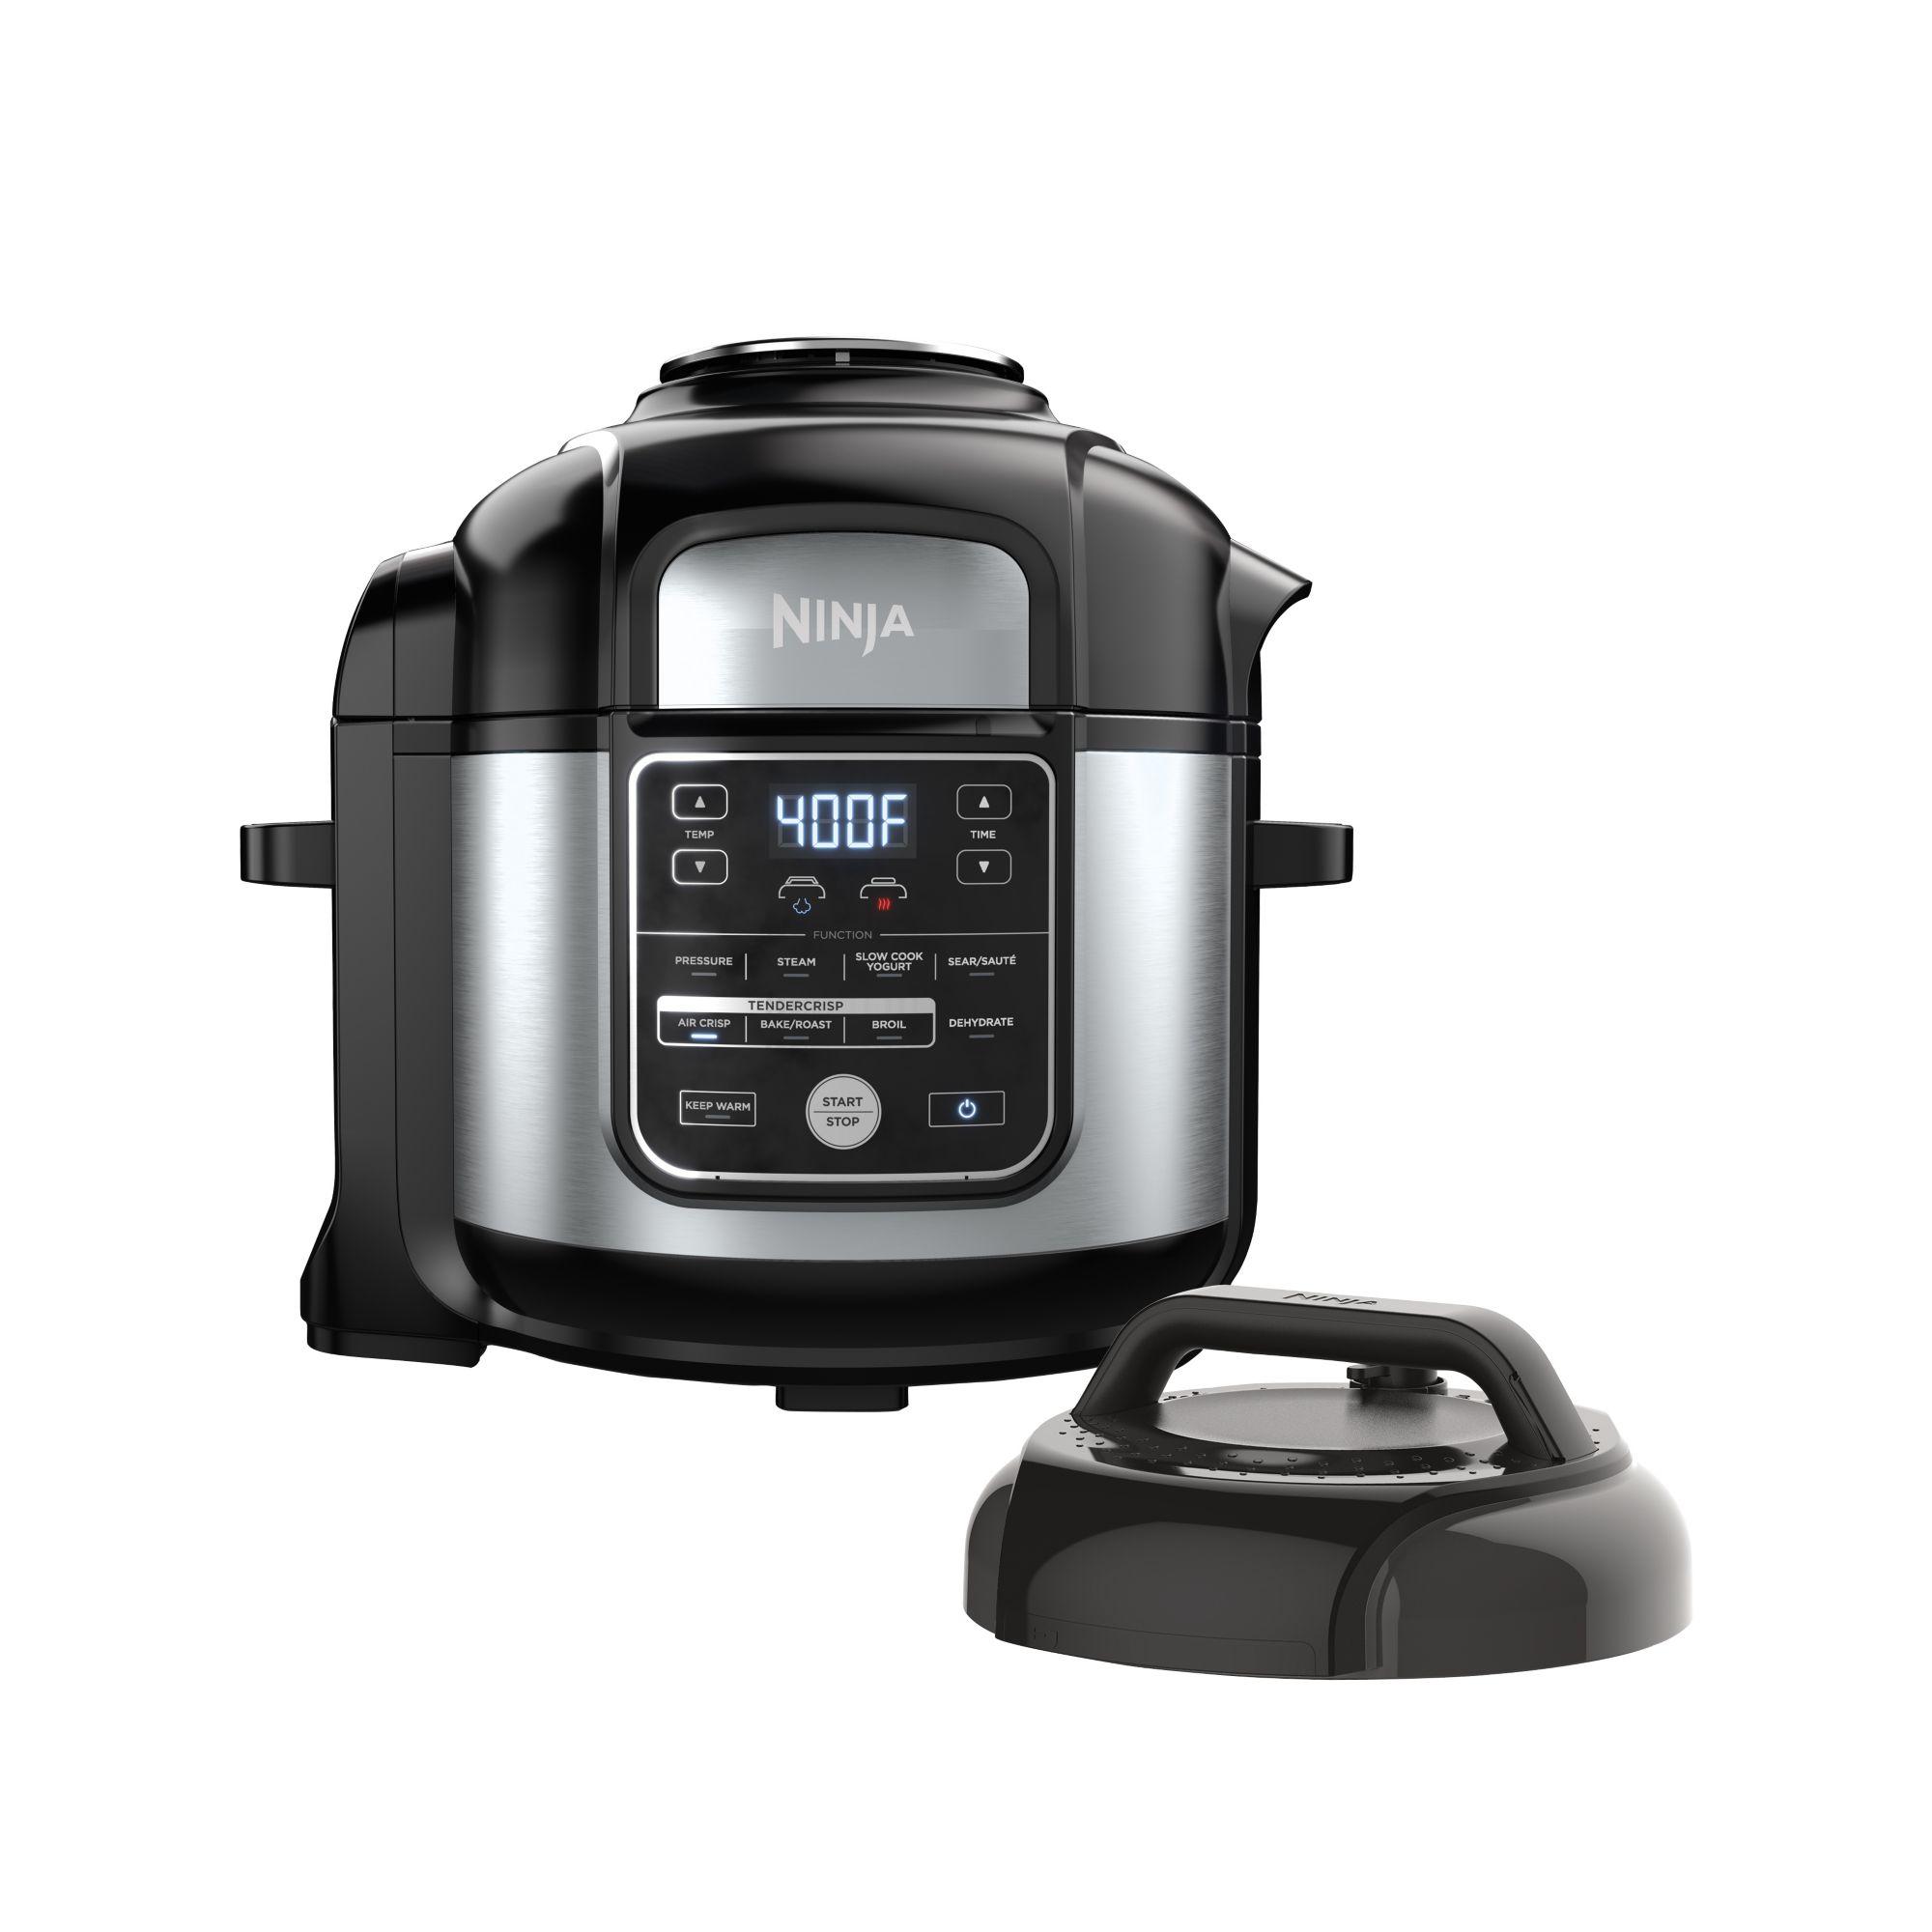 Ninja Foodi 8-Qt. 10-in-1 XL Pressure Cooker Air Fryer Multicooker - S